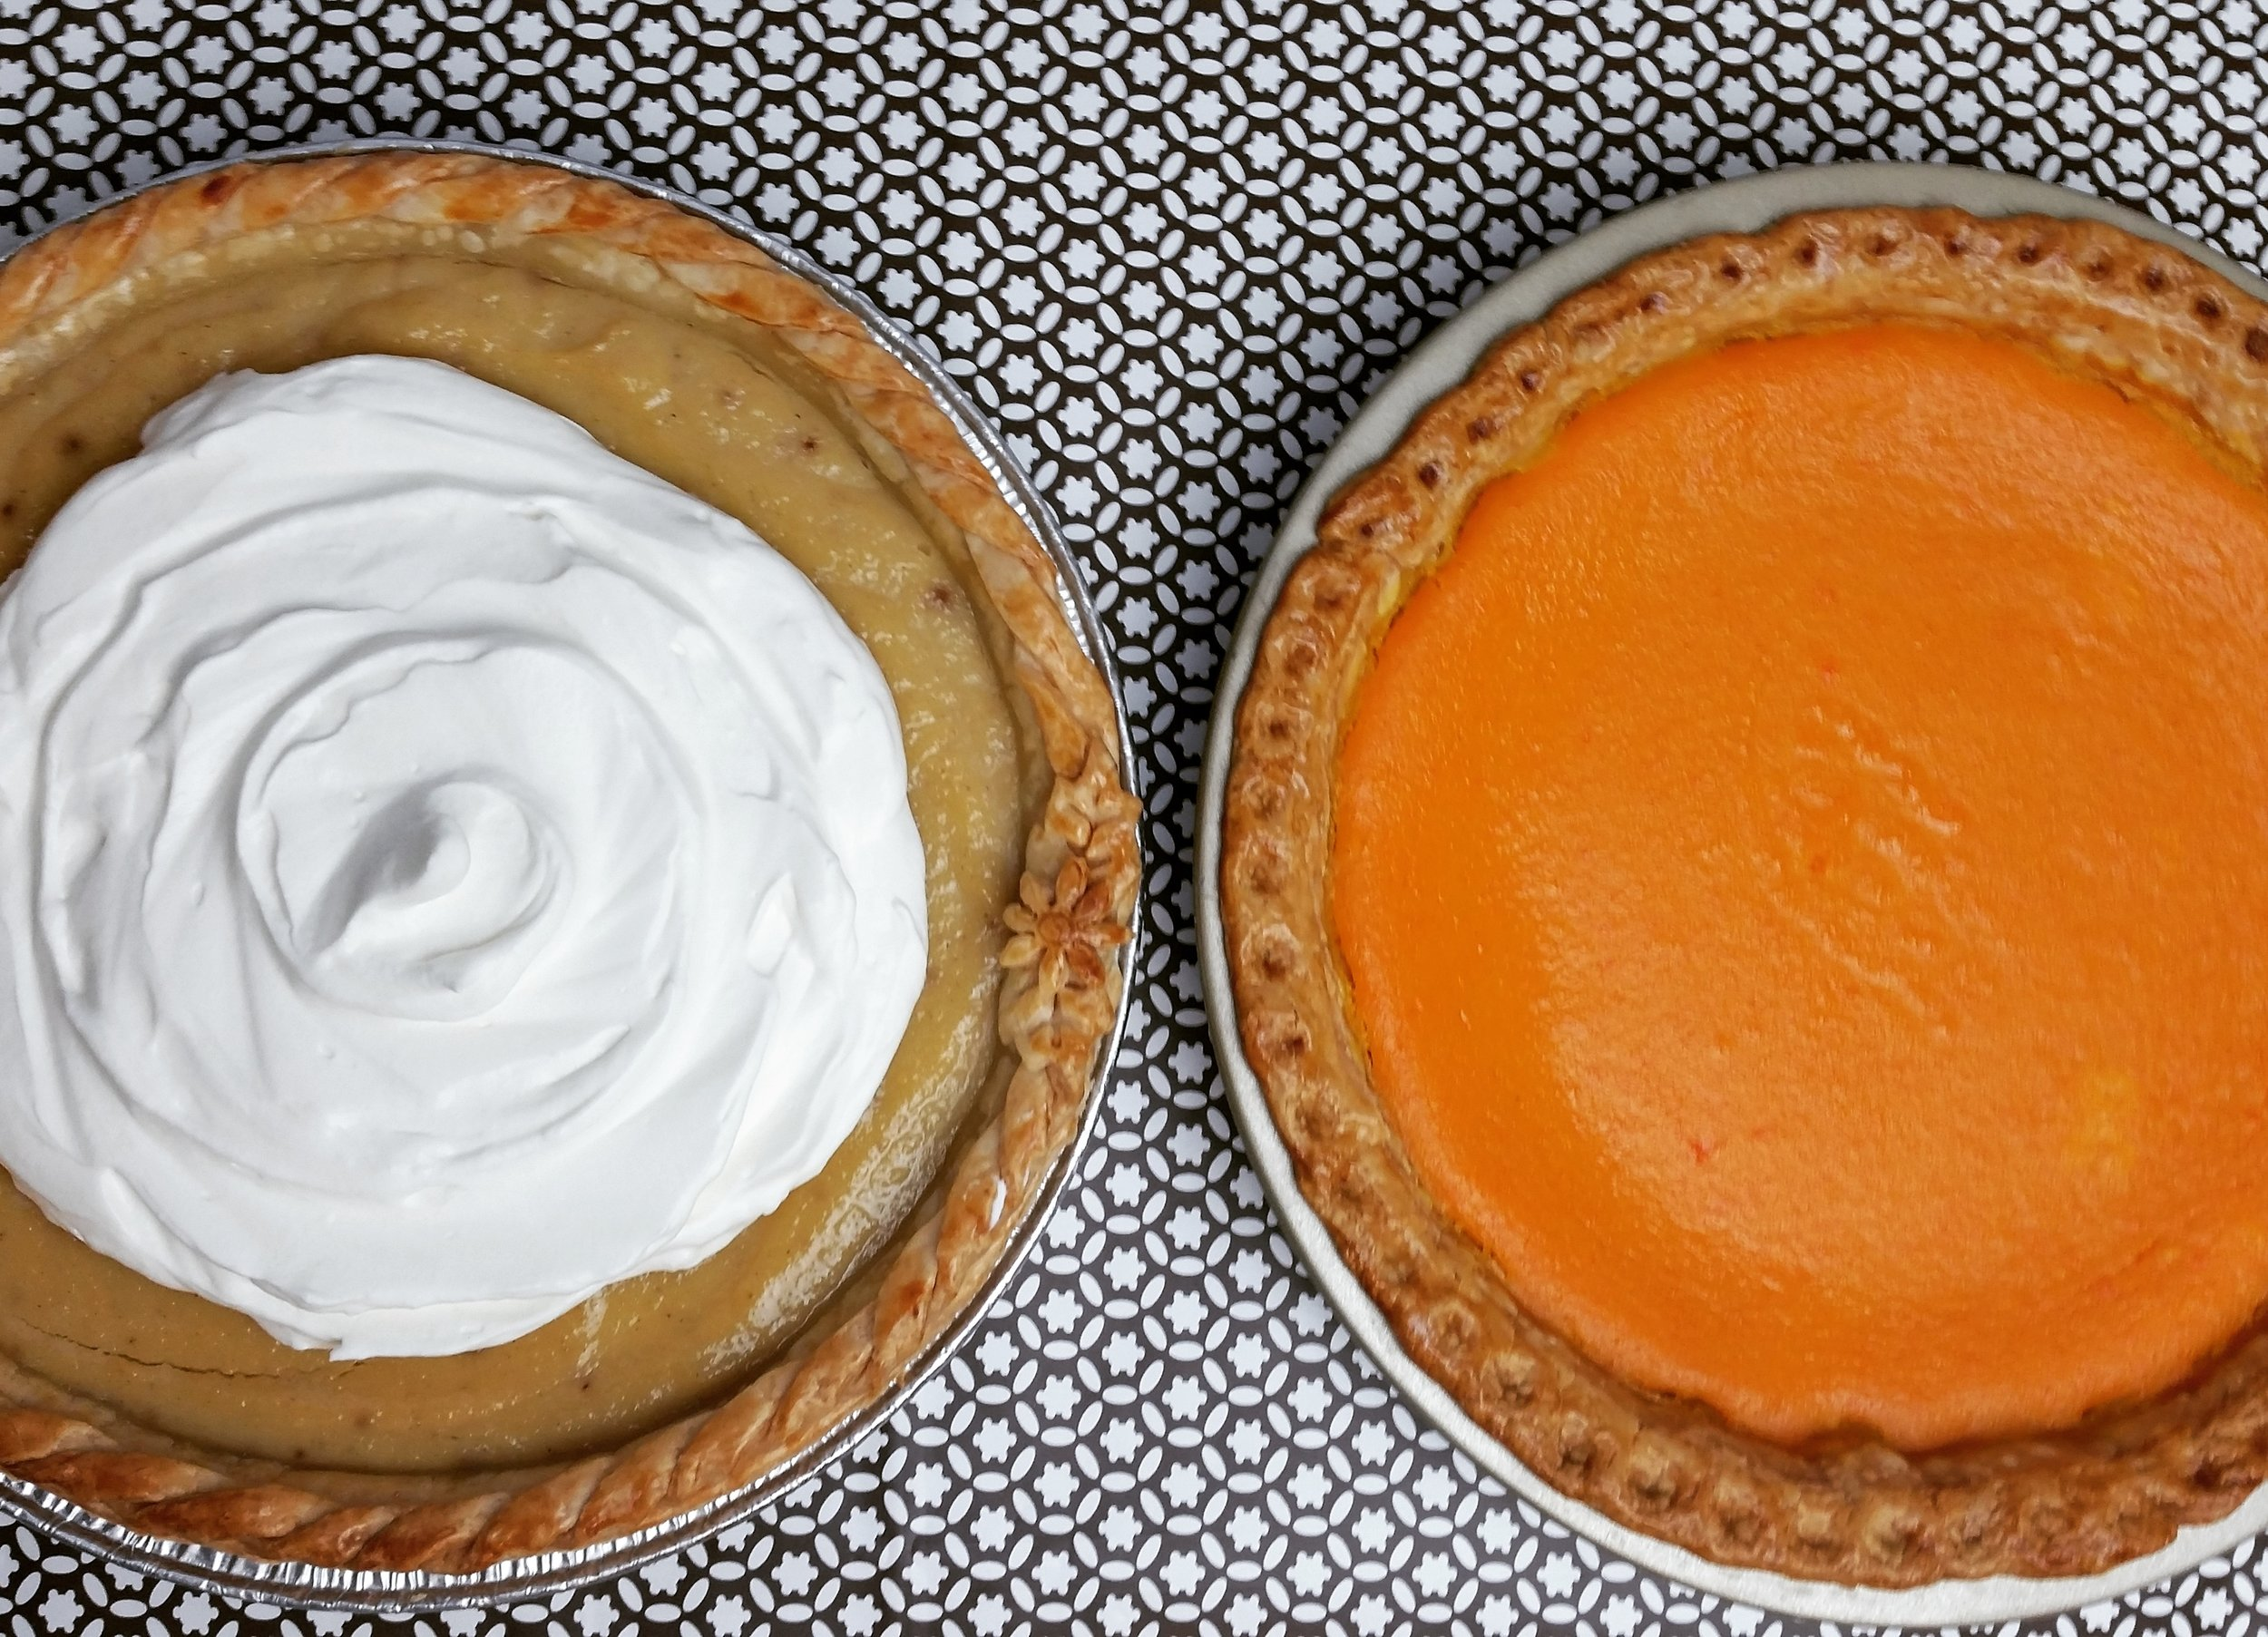 Parsnip Pie and Carrot Pie